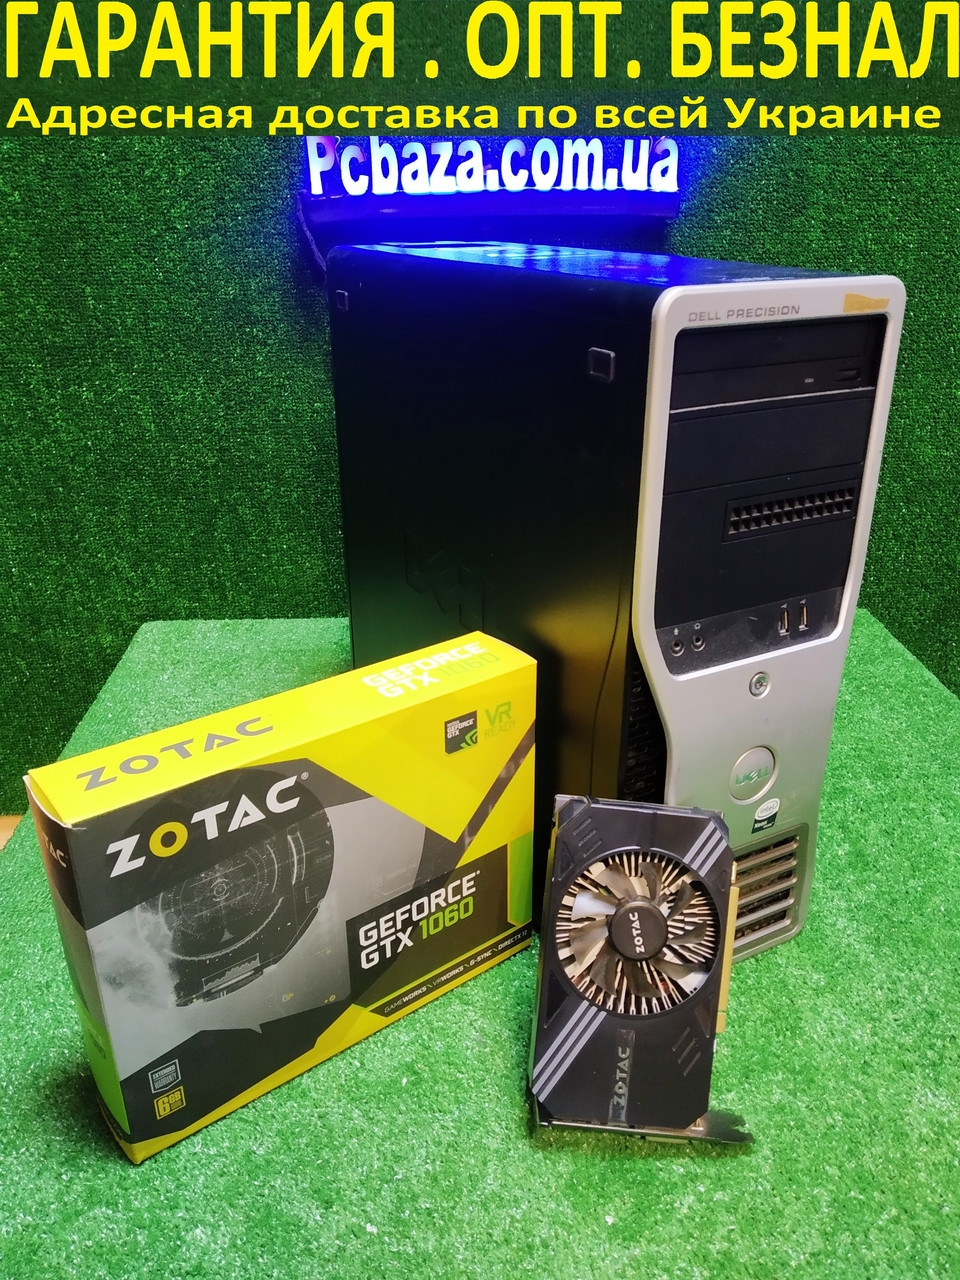 Игровой Настроенный Dell Precision t3500, 6(12) ядер, Core i7 (Xeon) 12gb ОЗУ, 250SSD+1000GB HDD, GTX1060 6 GB